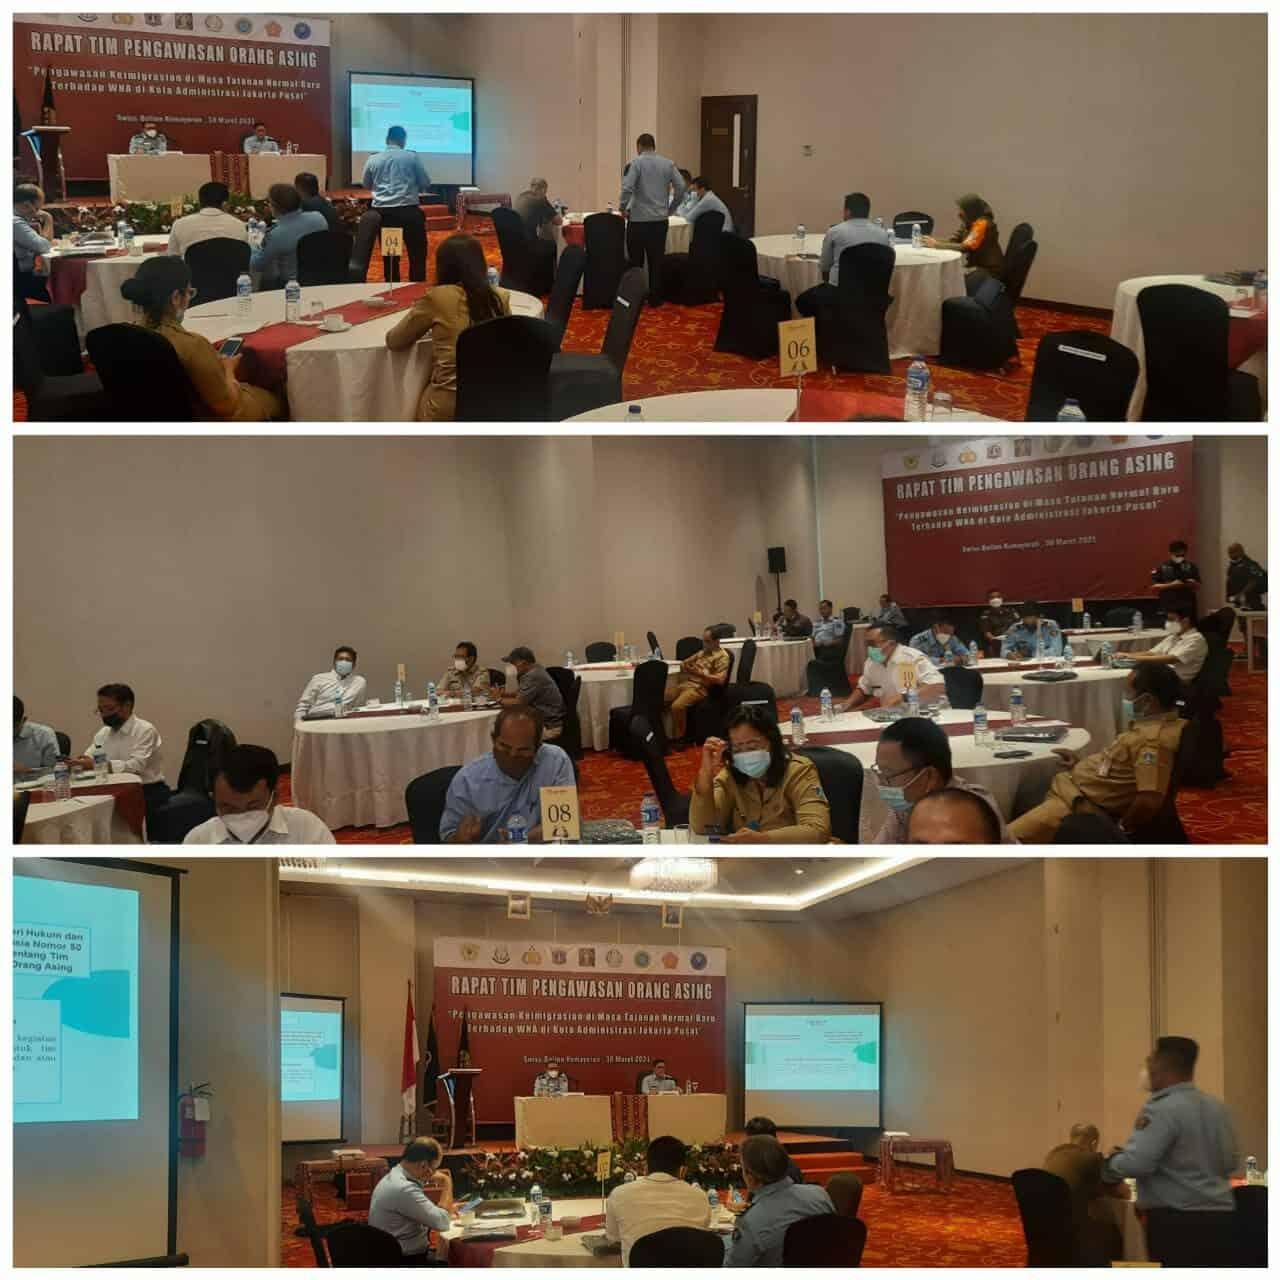 Rapat TIMPORA (Pengawasan Keimigrasian di Masa Tatanan Normal Baru Terhadap WNA di Kota Administrasi Jakarta Pusat).